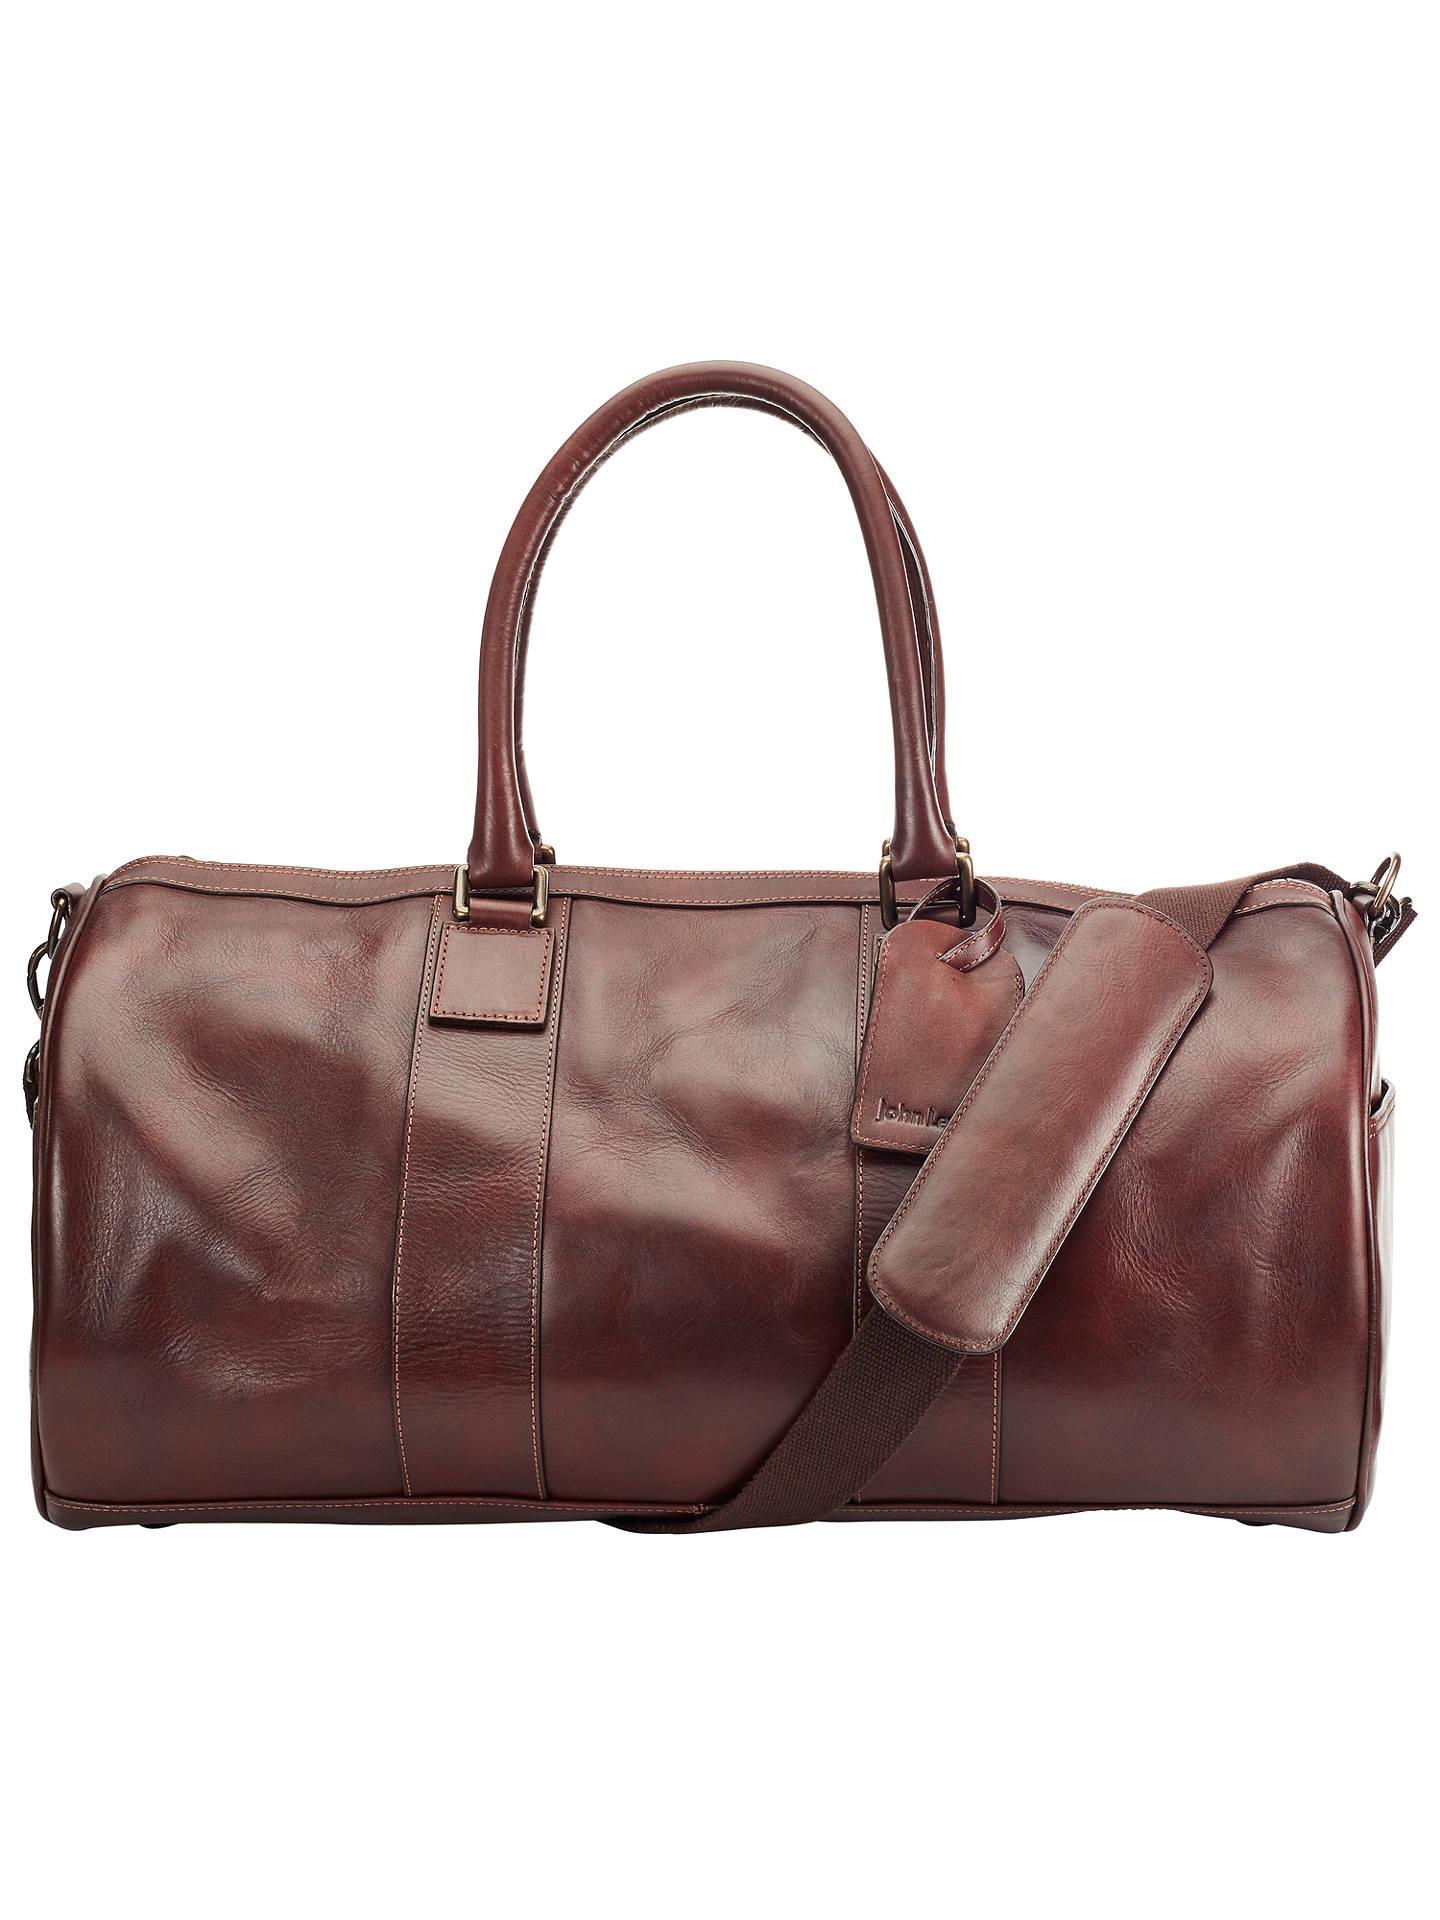 John Lewis Gladstone Leather Barrel Bag Antique Tan Online At Johnlewis